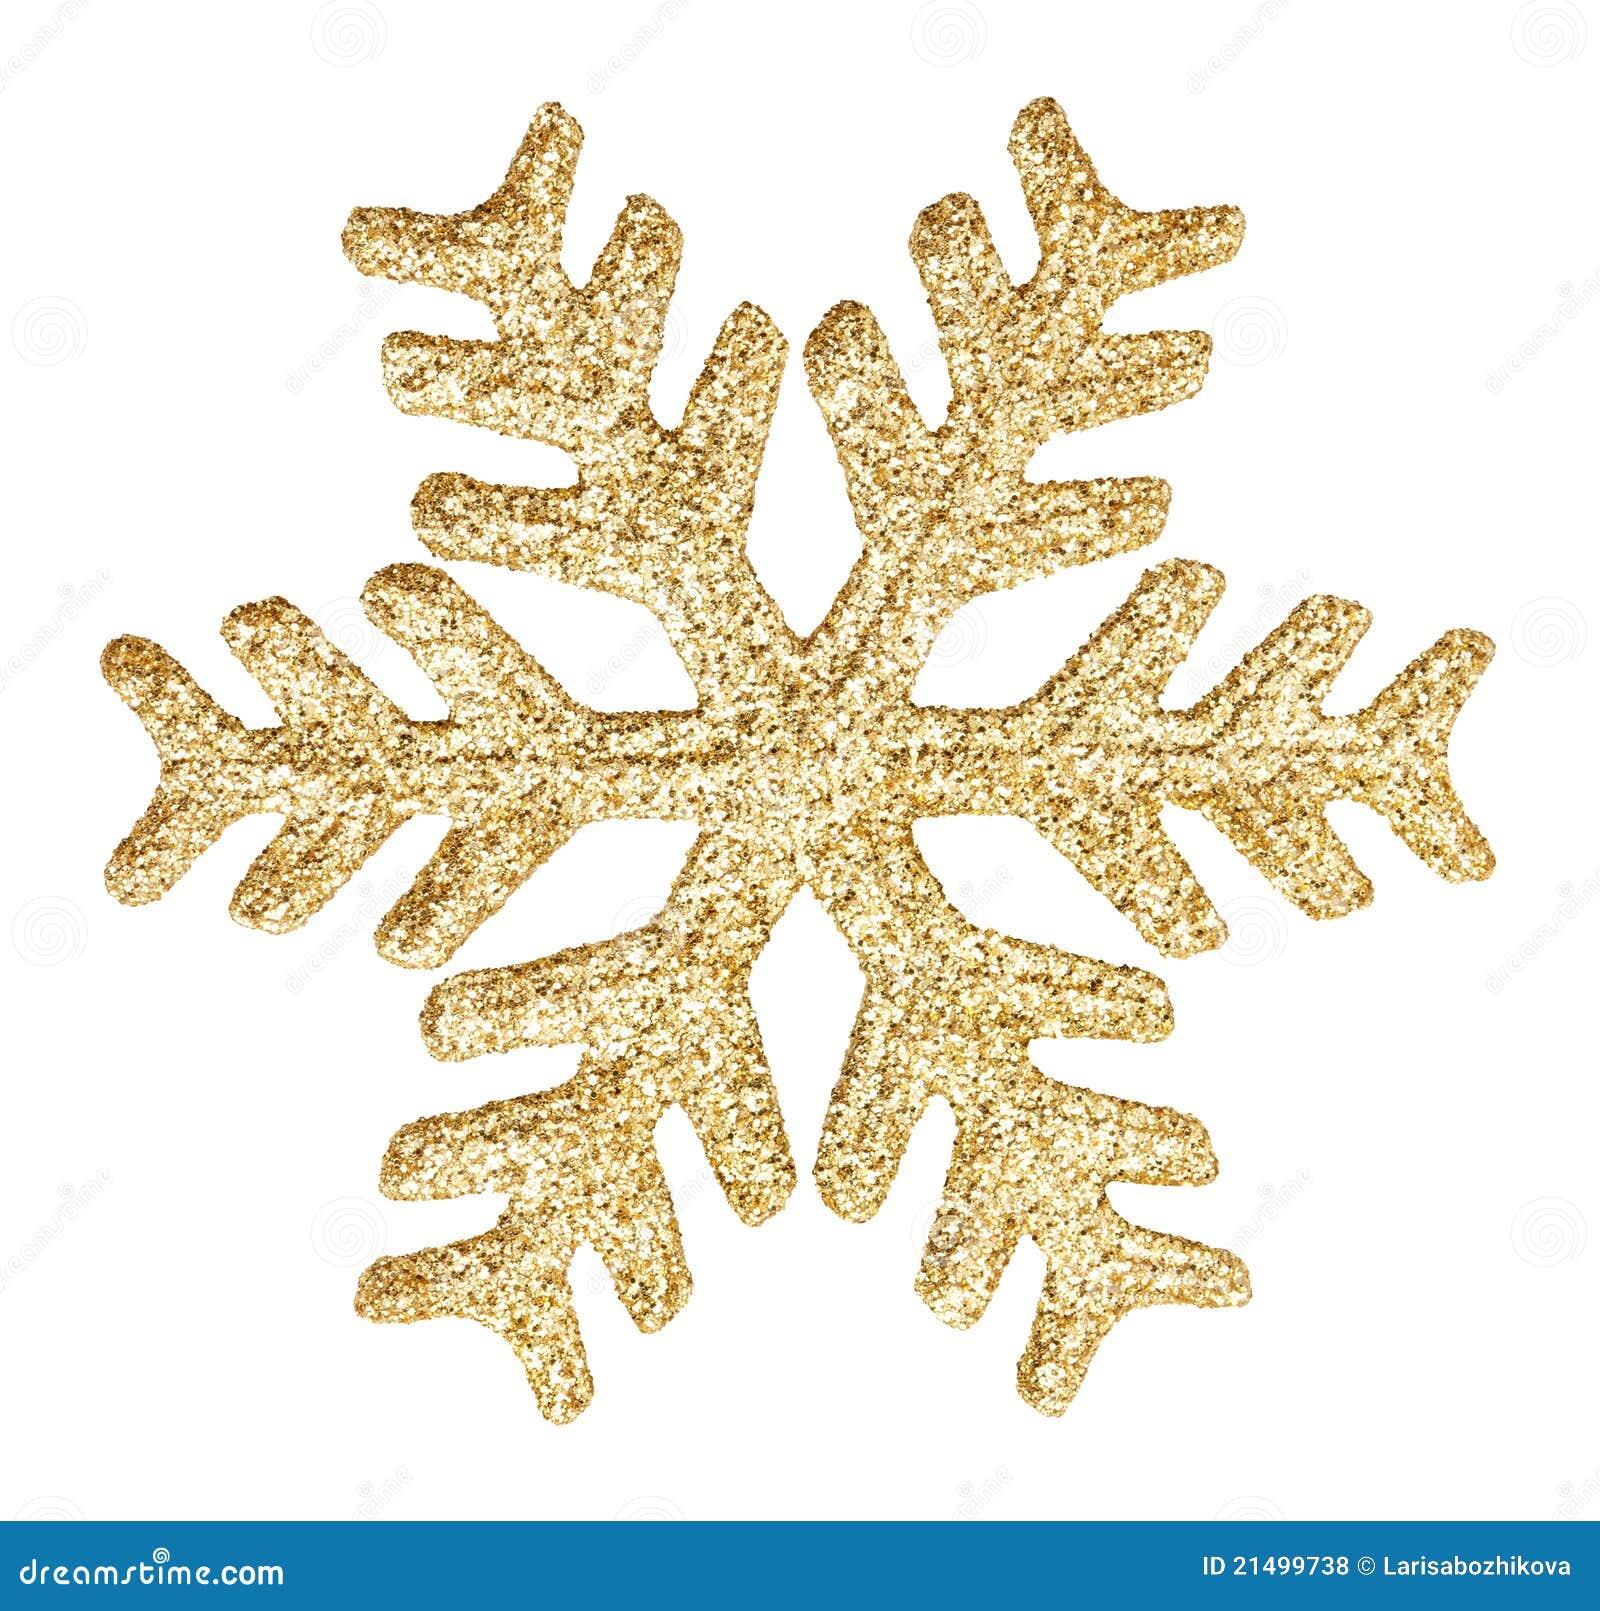 Gold Glitter Snowflake Royalty Free Stock Photos - Image: 21499738 Falling Snowflake Vector